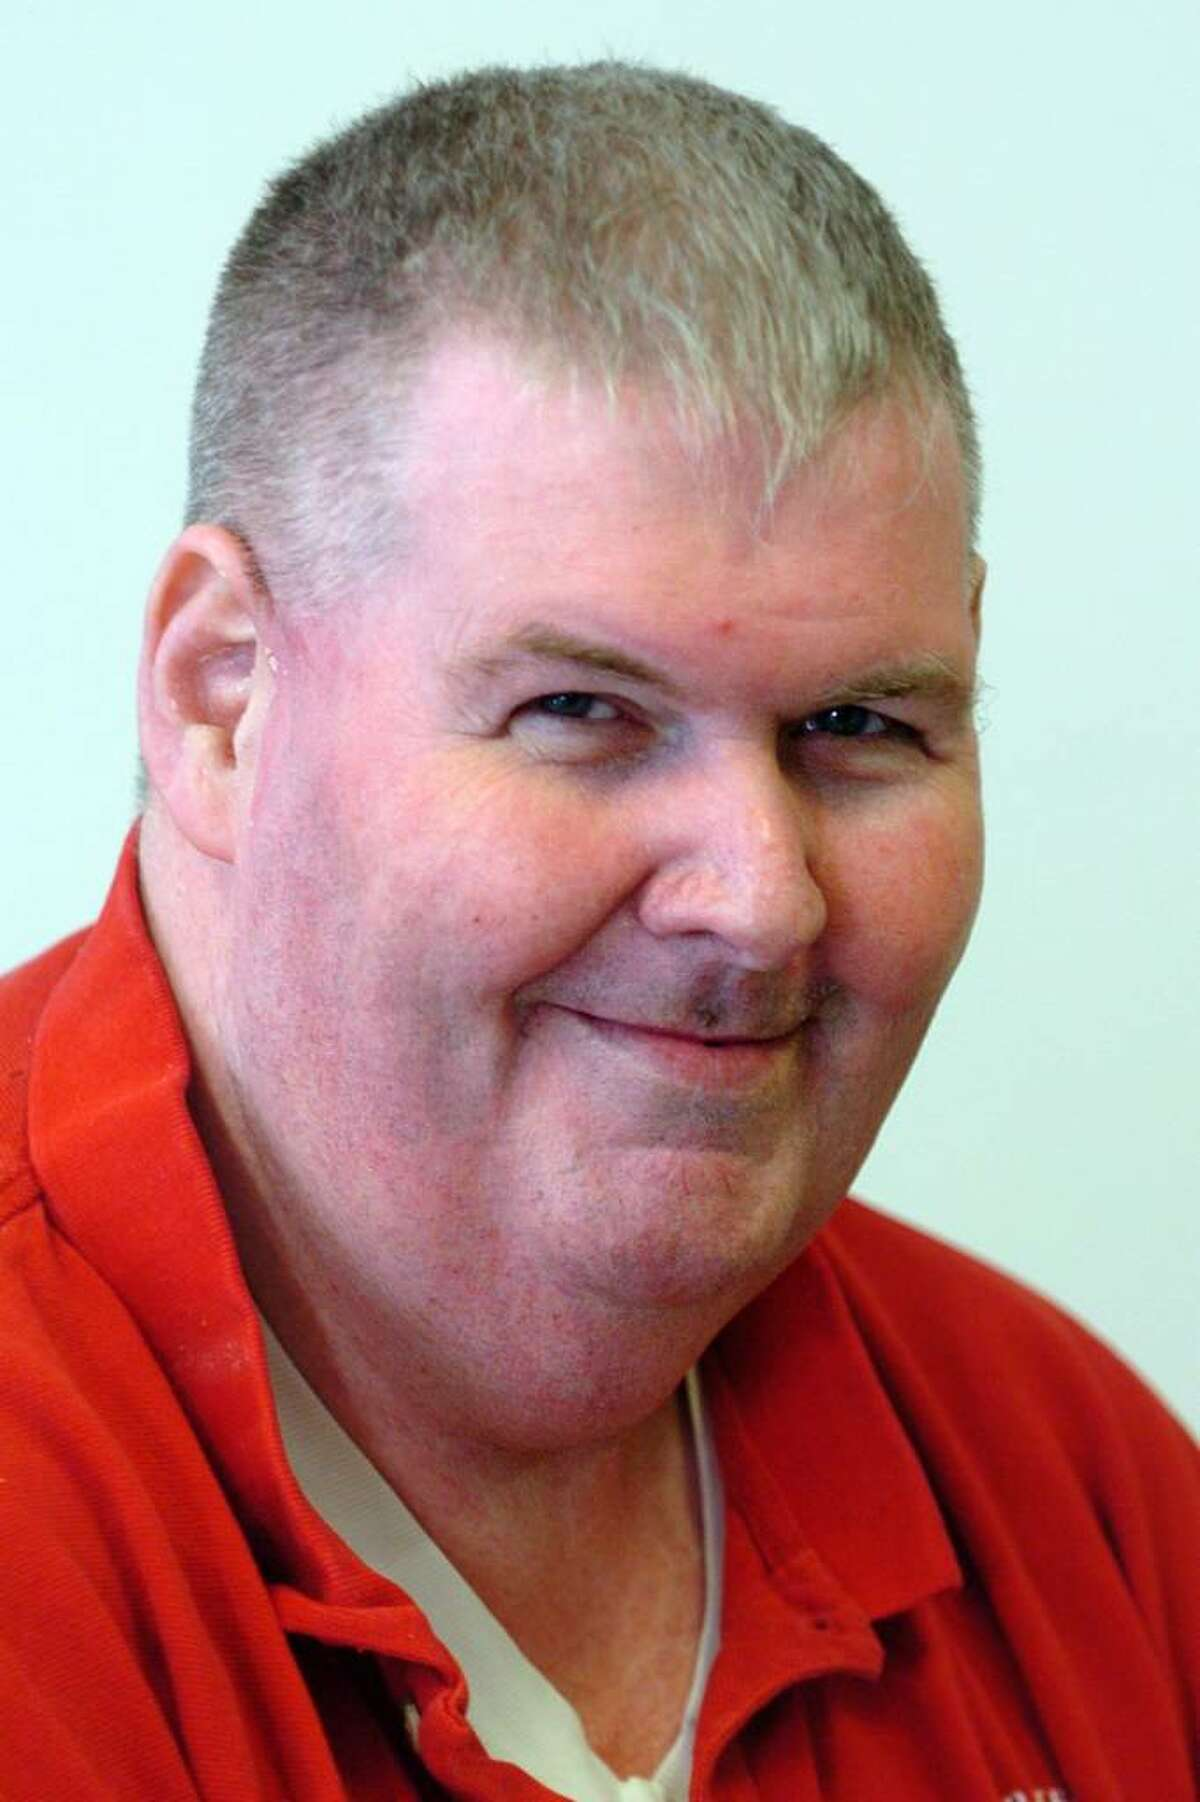 Stratford independent mayoral candidate George Mulligan headshot.